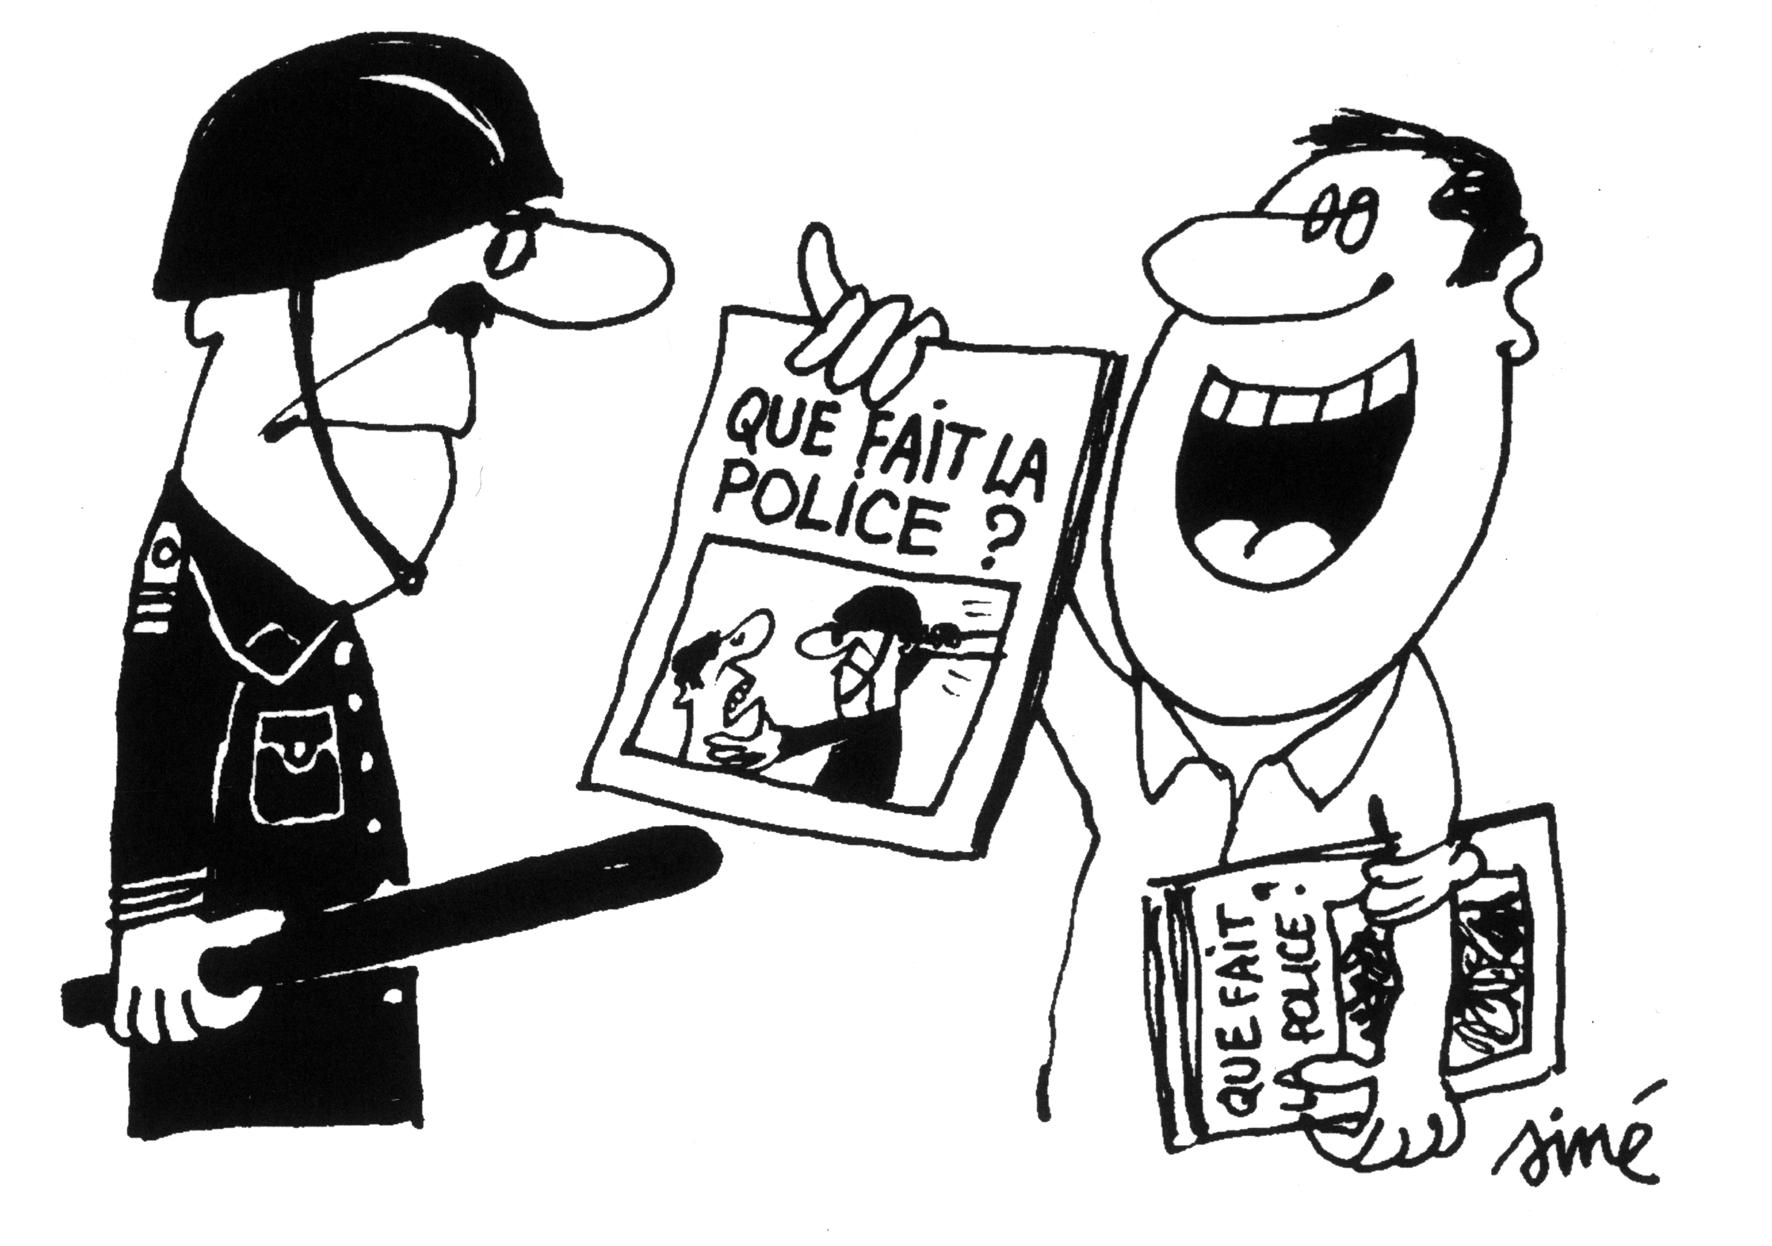 http://quefaitlapolice.samizdat.net/wp-content/uploads/2007/08/1-que-fait-la-police.jpg